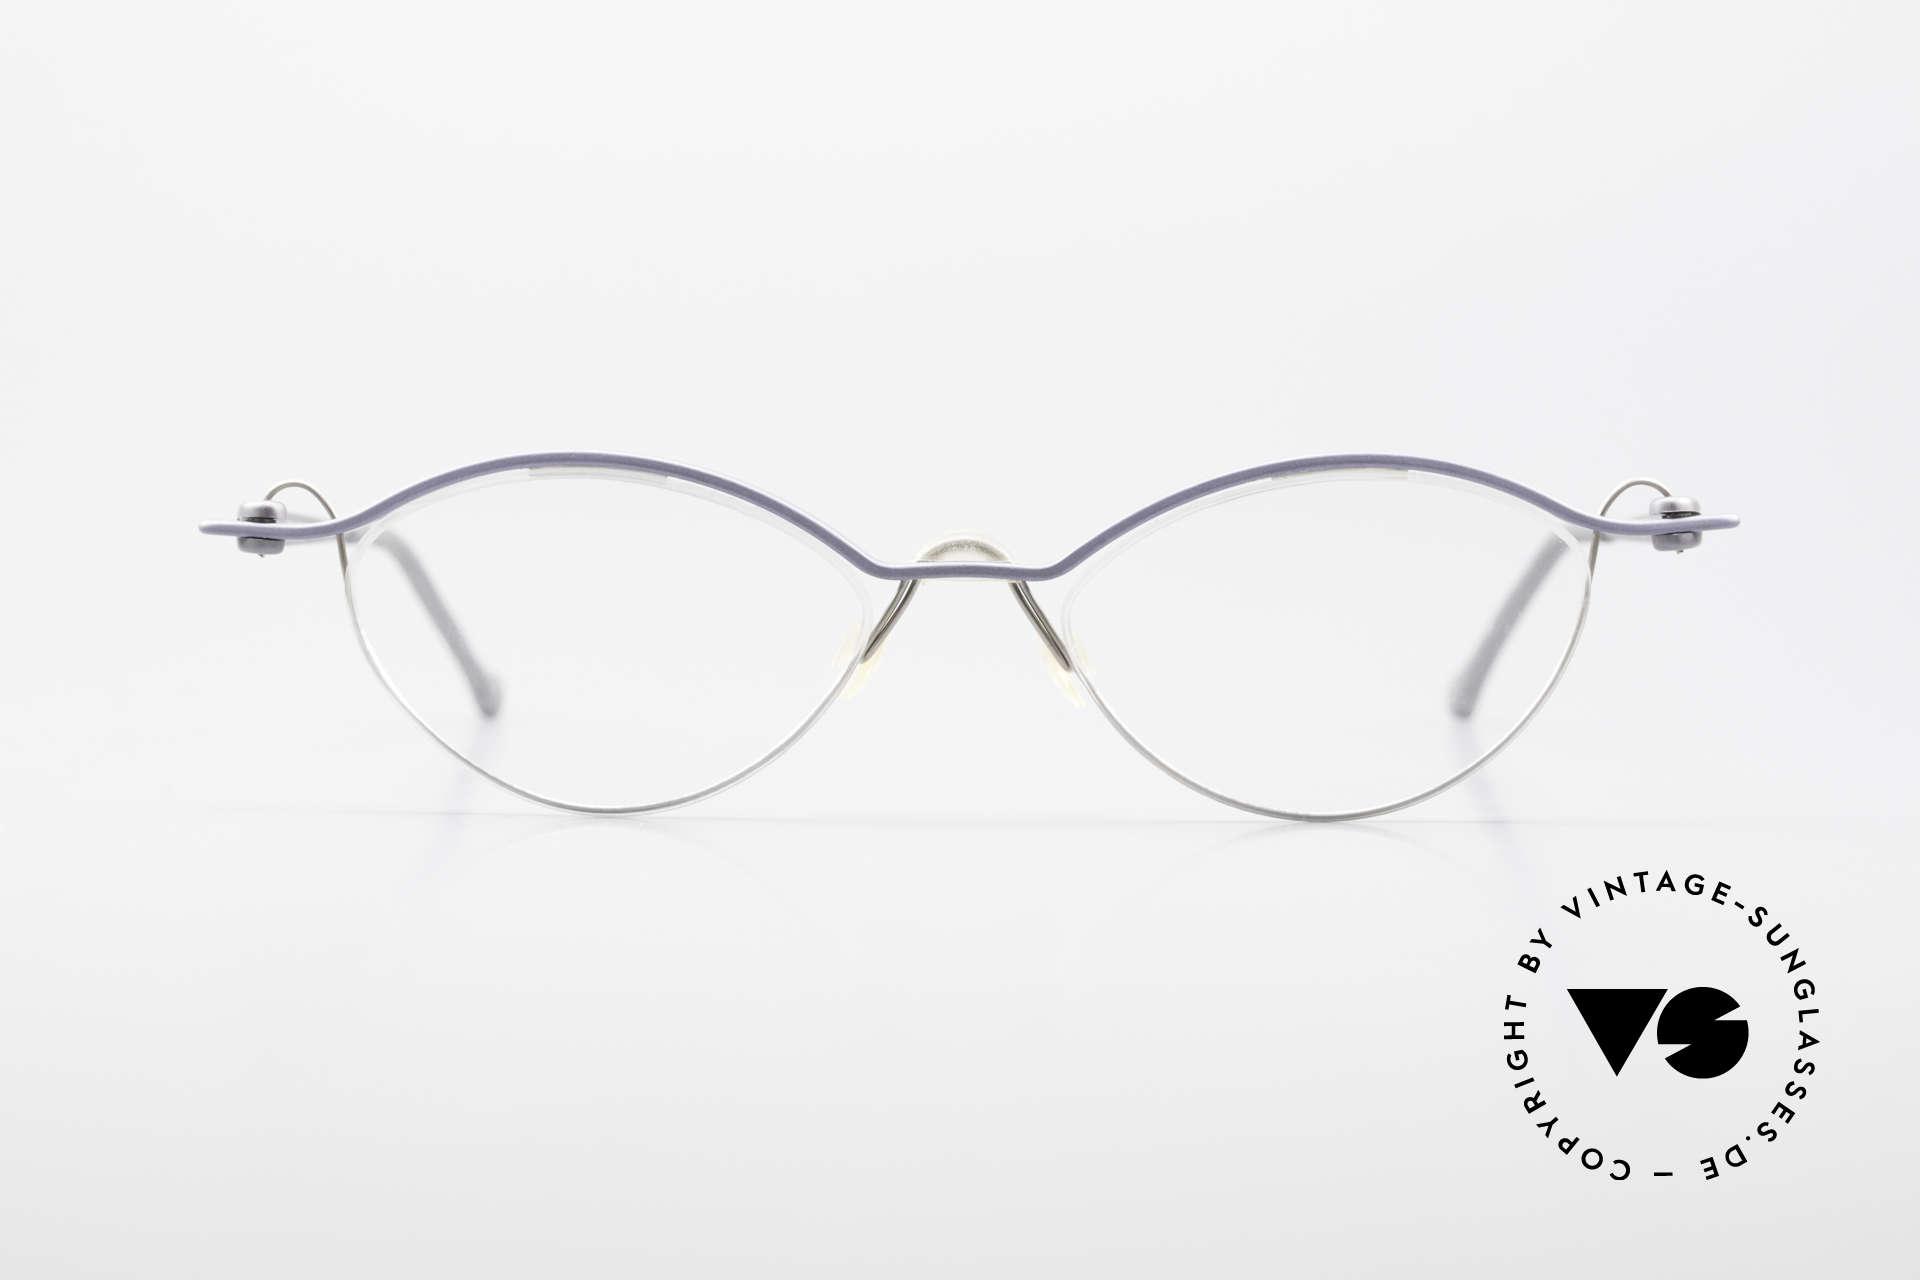 ProDesign No26 Aluminium Gail Spence Frame, true vintage aluminium frame - Gail Spence Design, Made for Men and Women